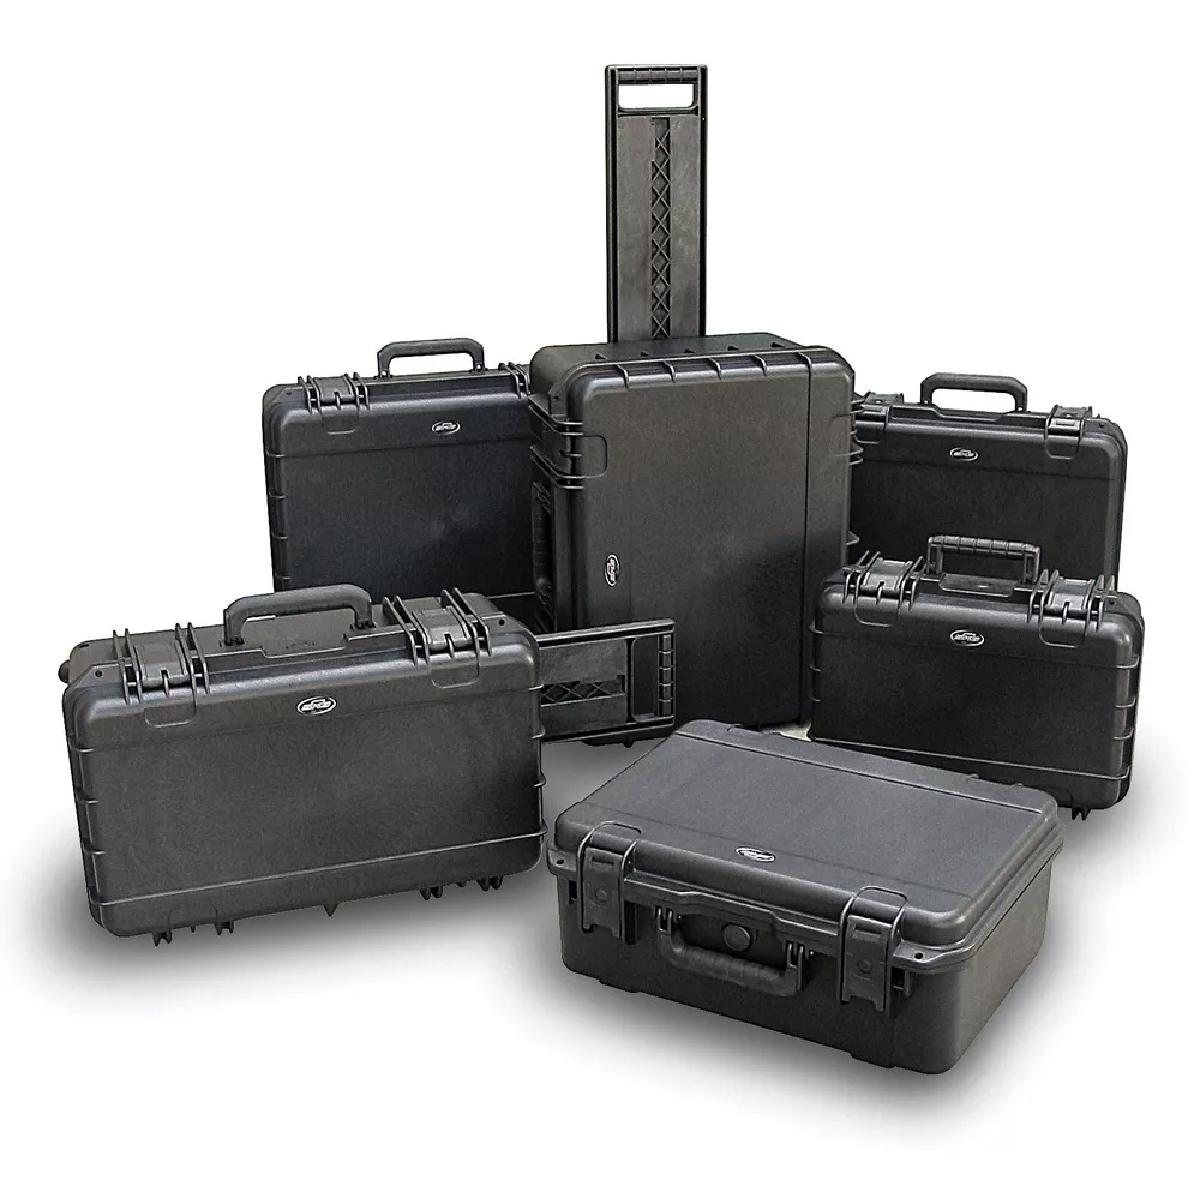 Koffert alufiner – RiggPartner